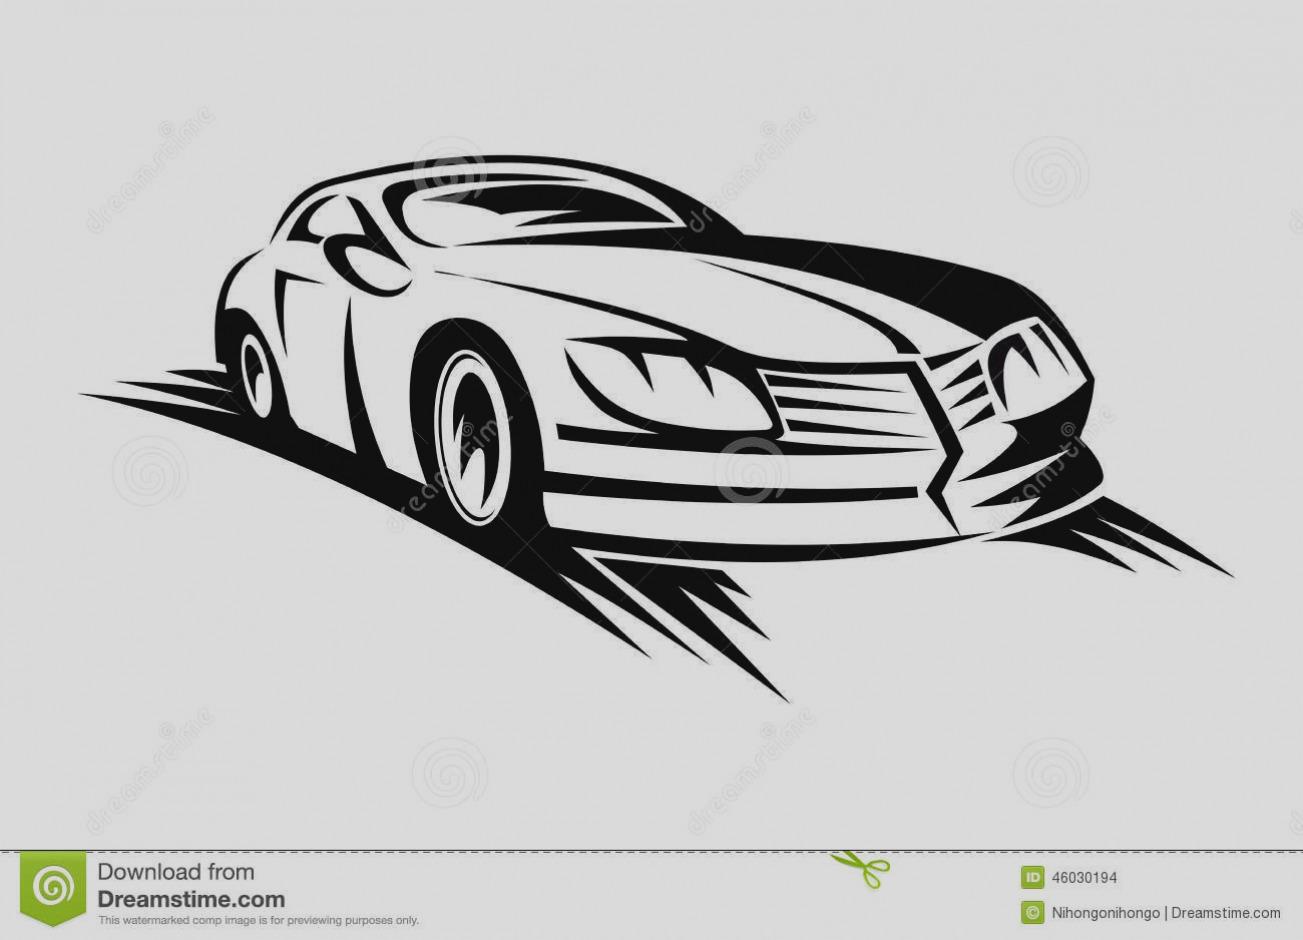 Beautiful of clip art. Cars clipart fast